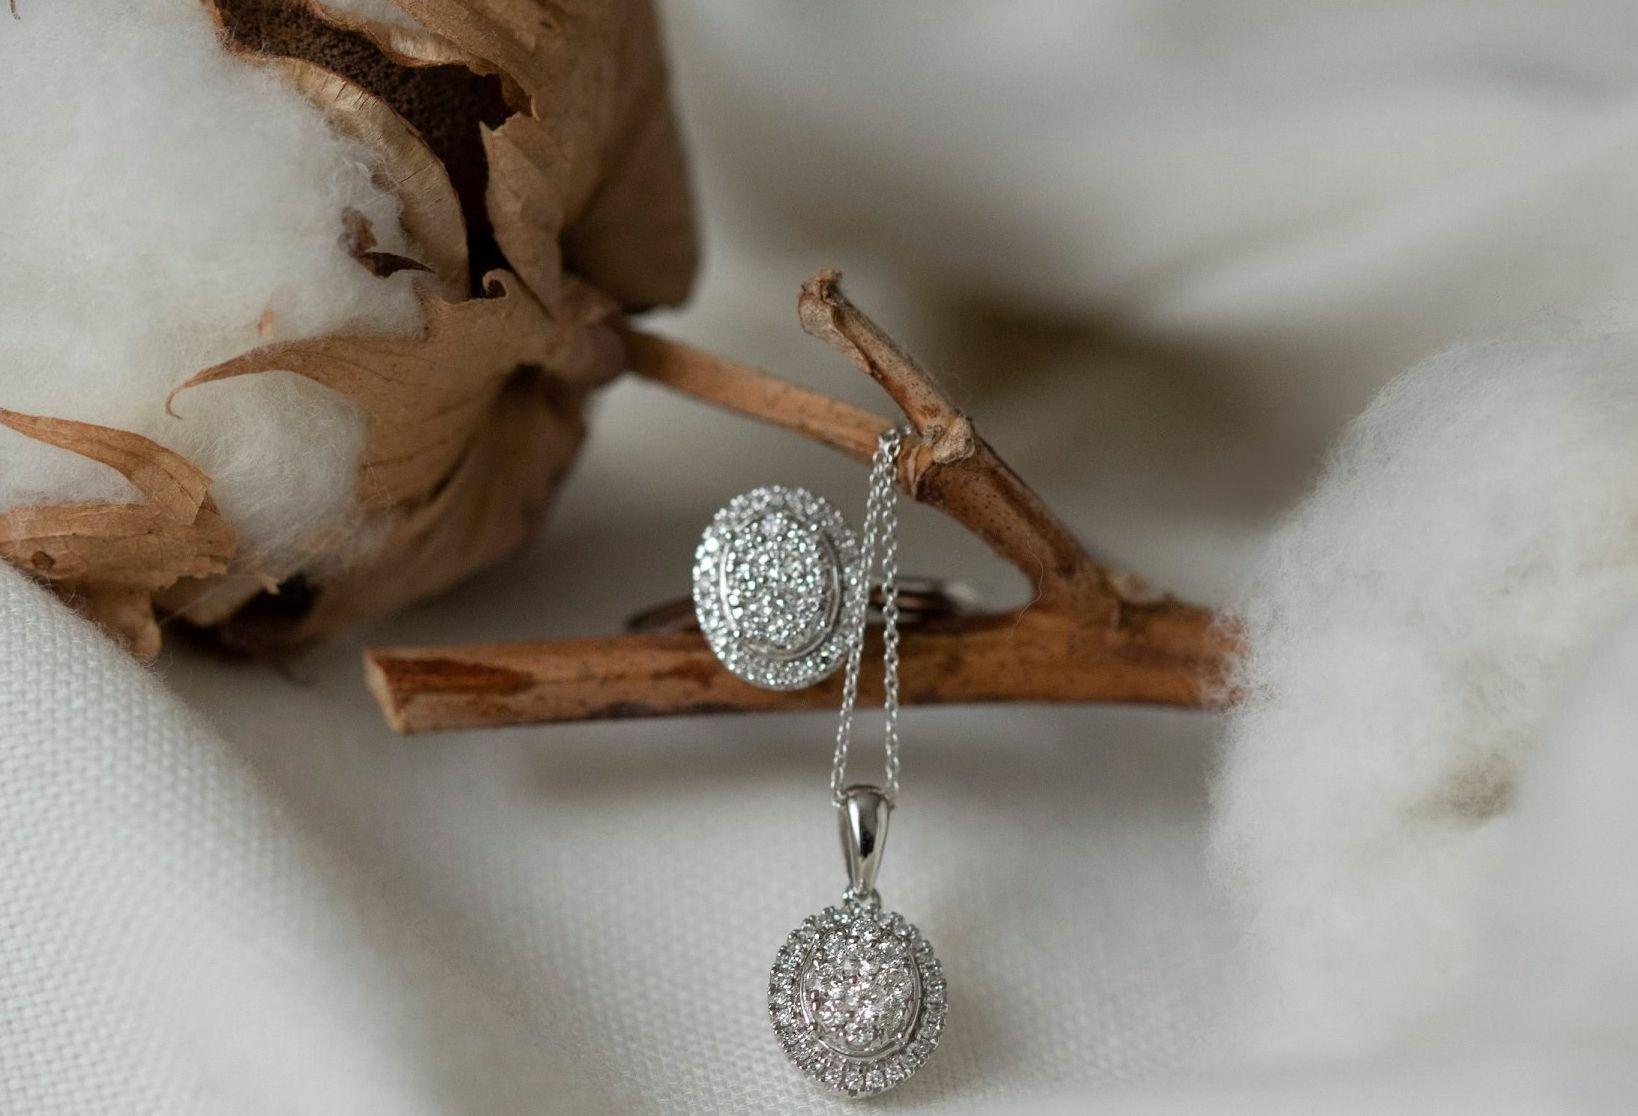 Objevte kouzlo briliantových šperků